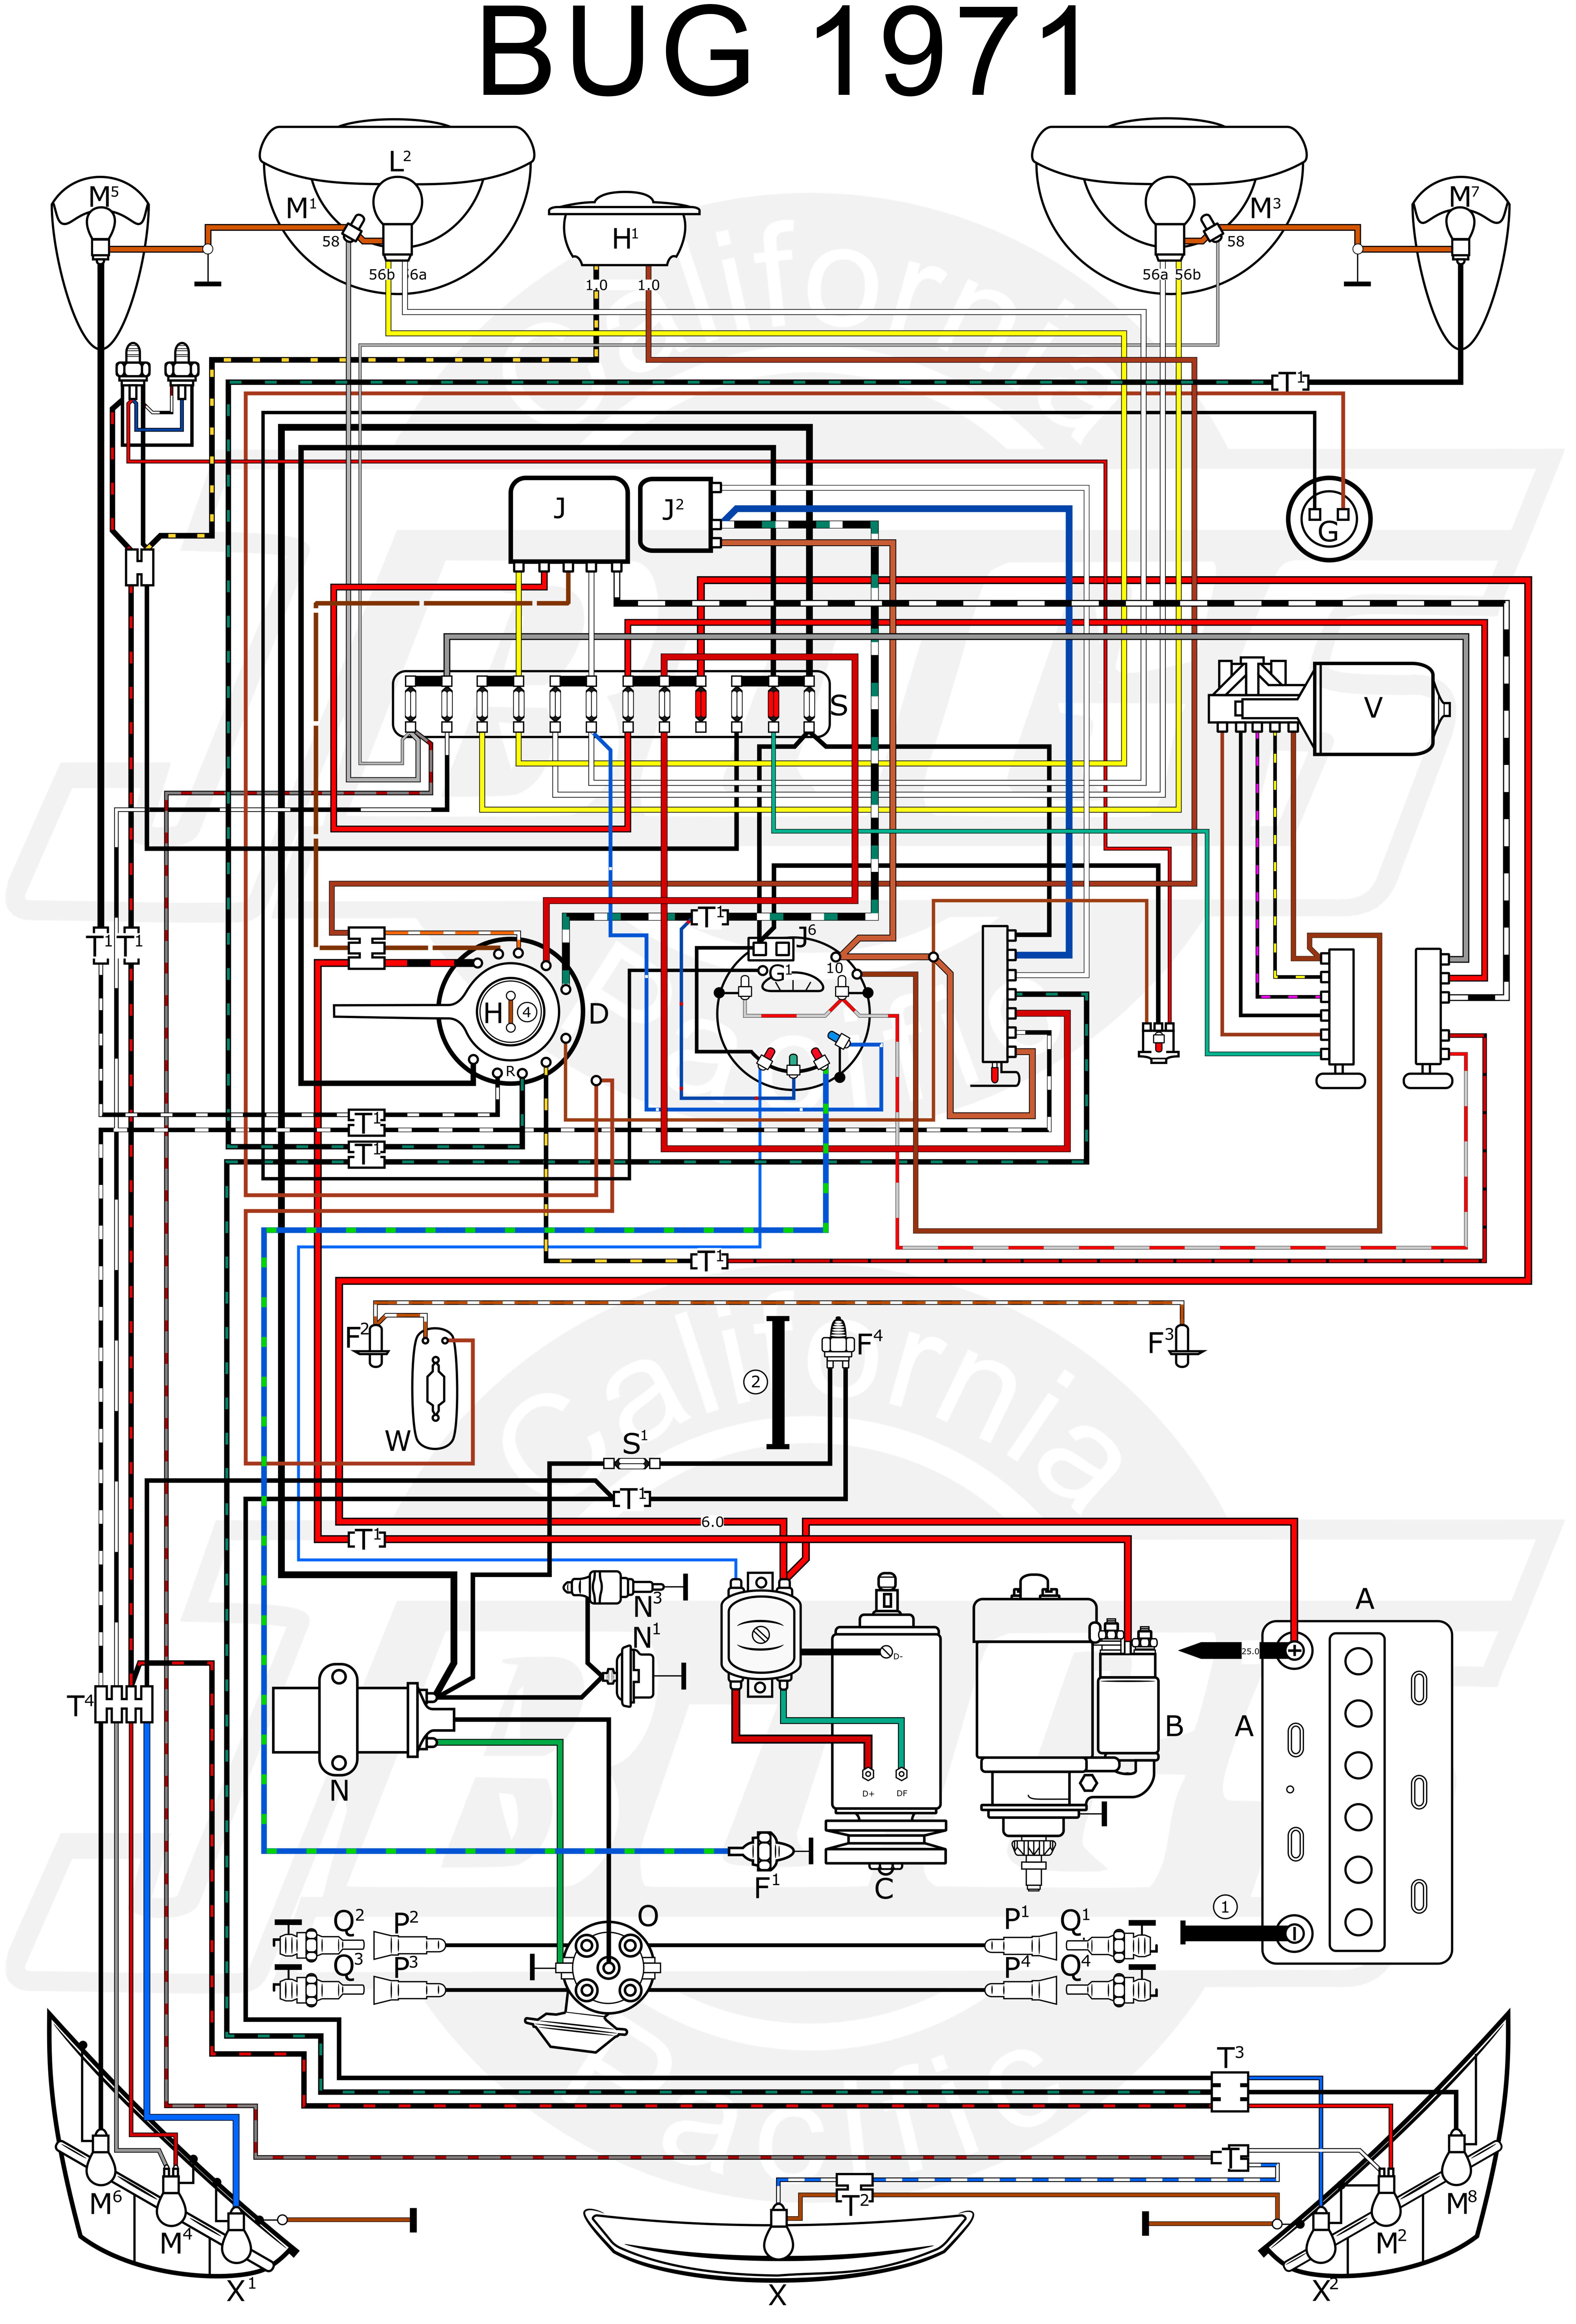 Vw Alternator Wiring Diagram from static-cdn.imageservice.cloud